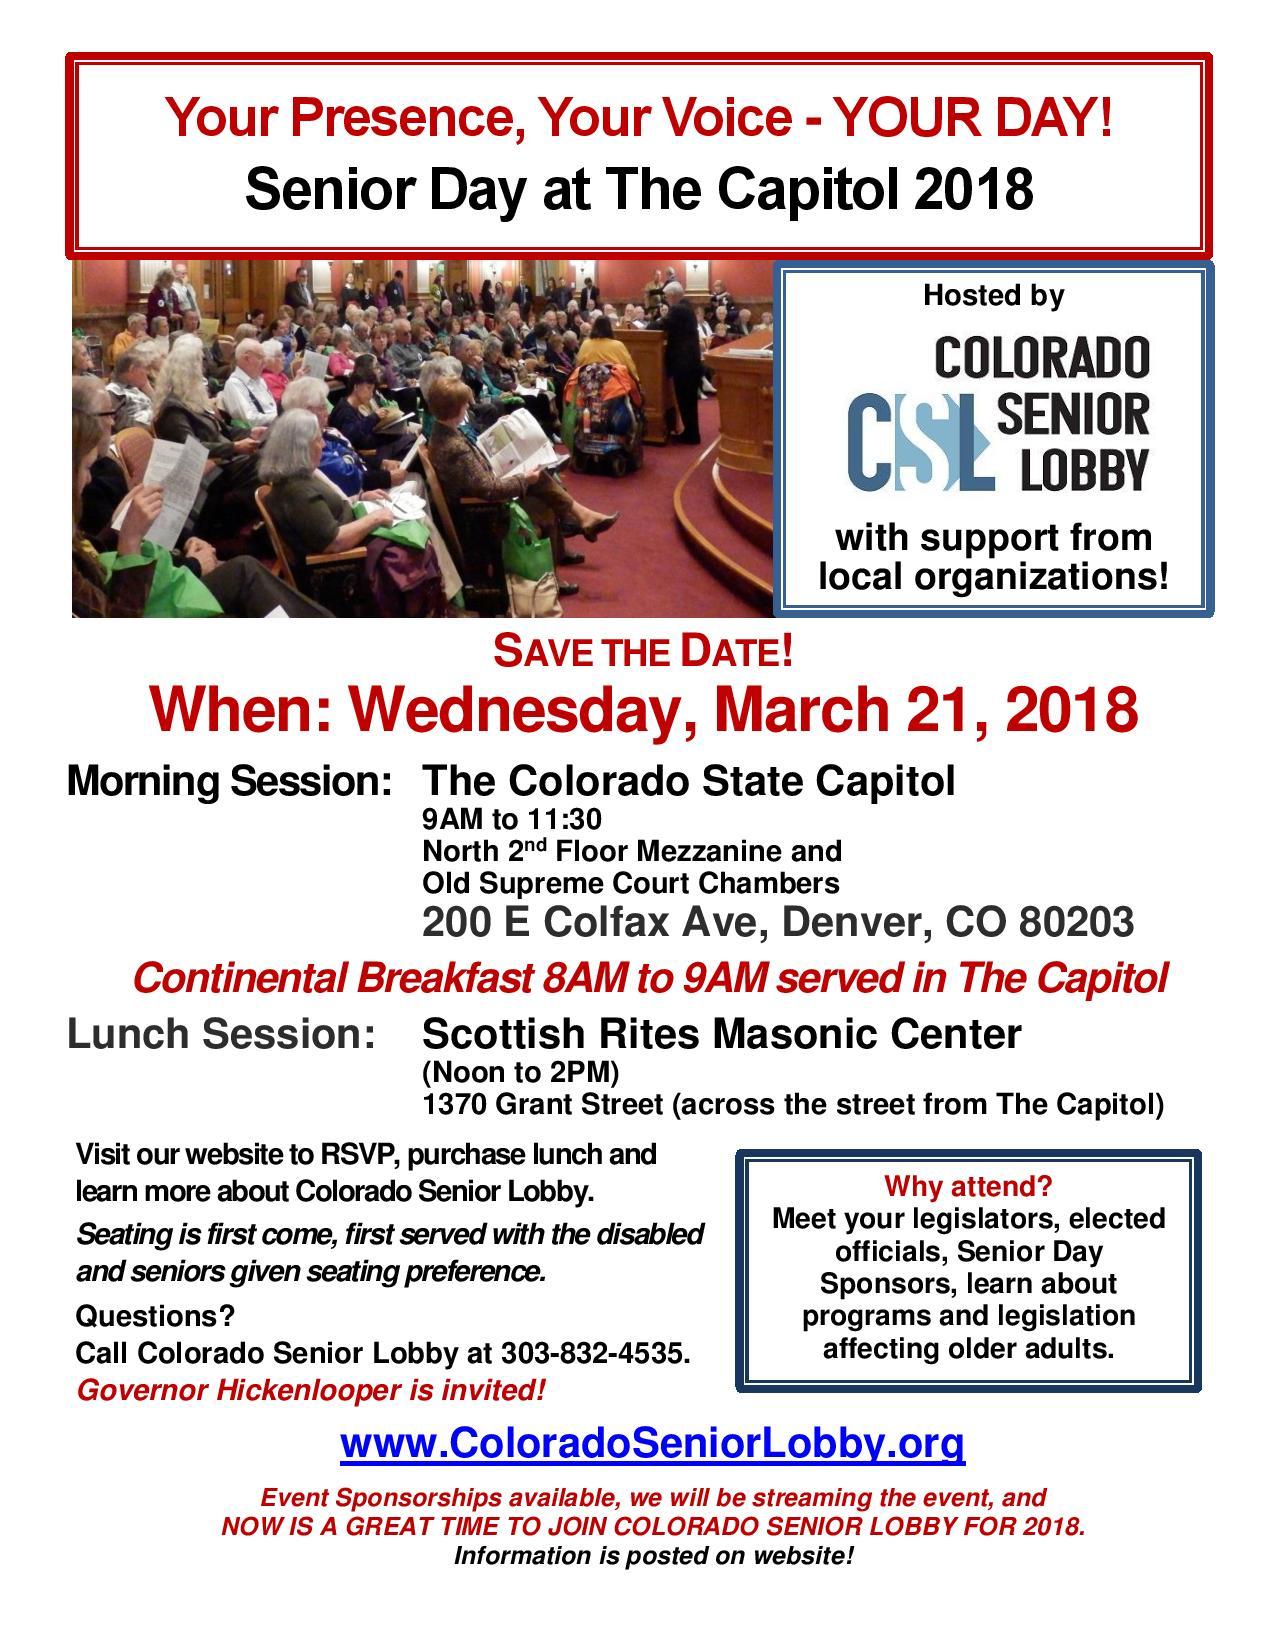 senior_day_at_capitol_3-21-18-page-001.jpg